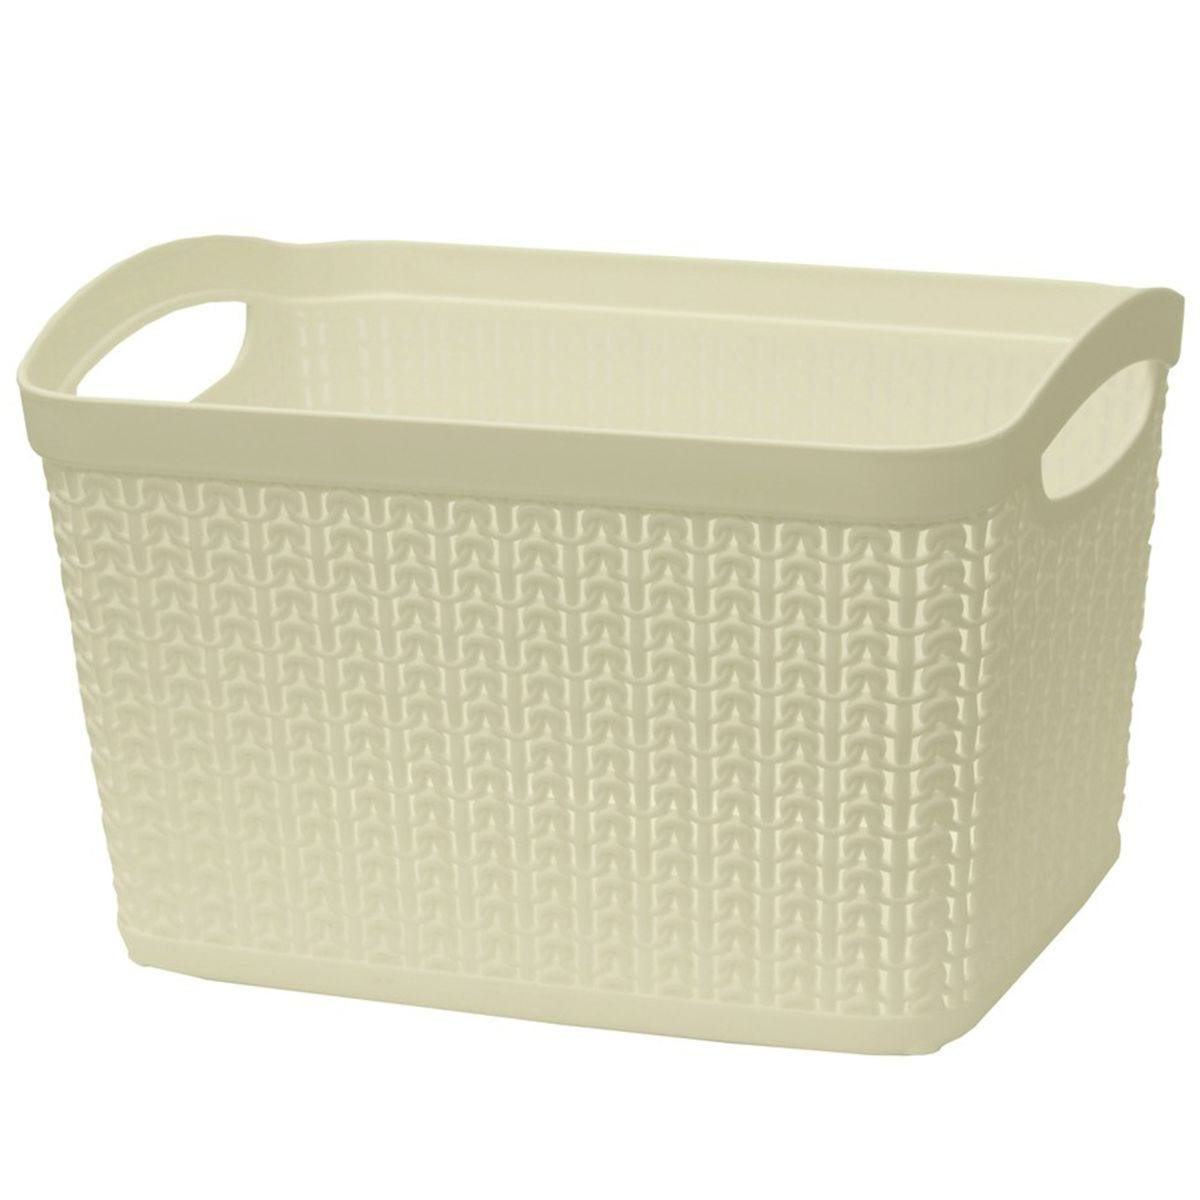 JVL Knit Design Loop Plastic Rectangular Small Storage Basket with Handles Ivory 20 x 26 x 17cm 6.6L